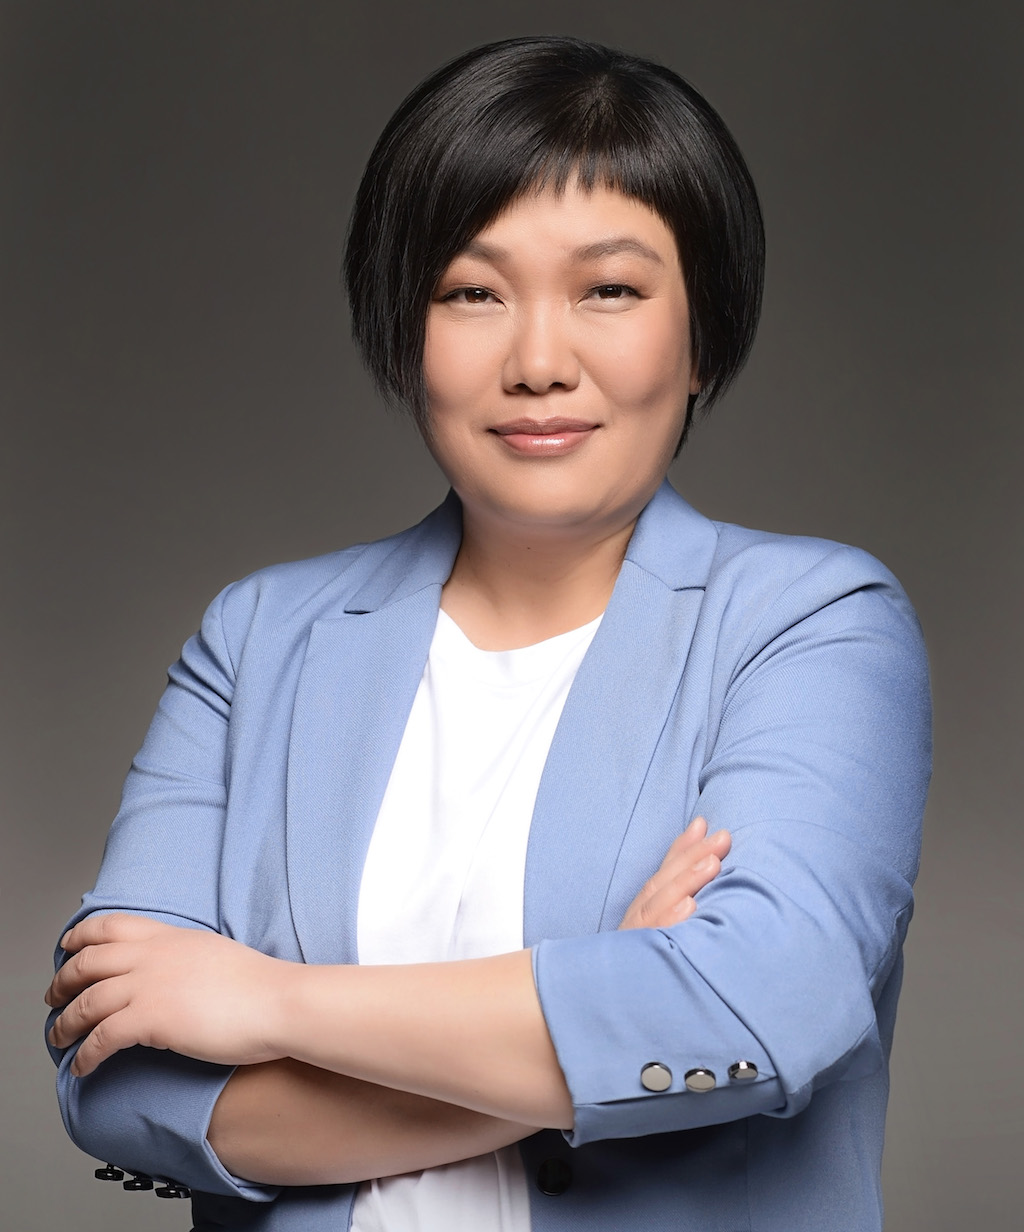 Бакальчук Татьяна Владимировна